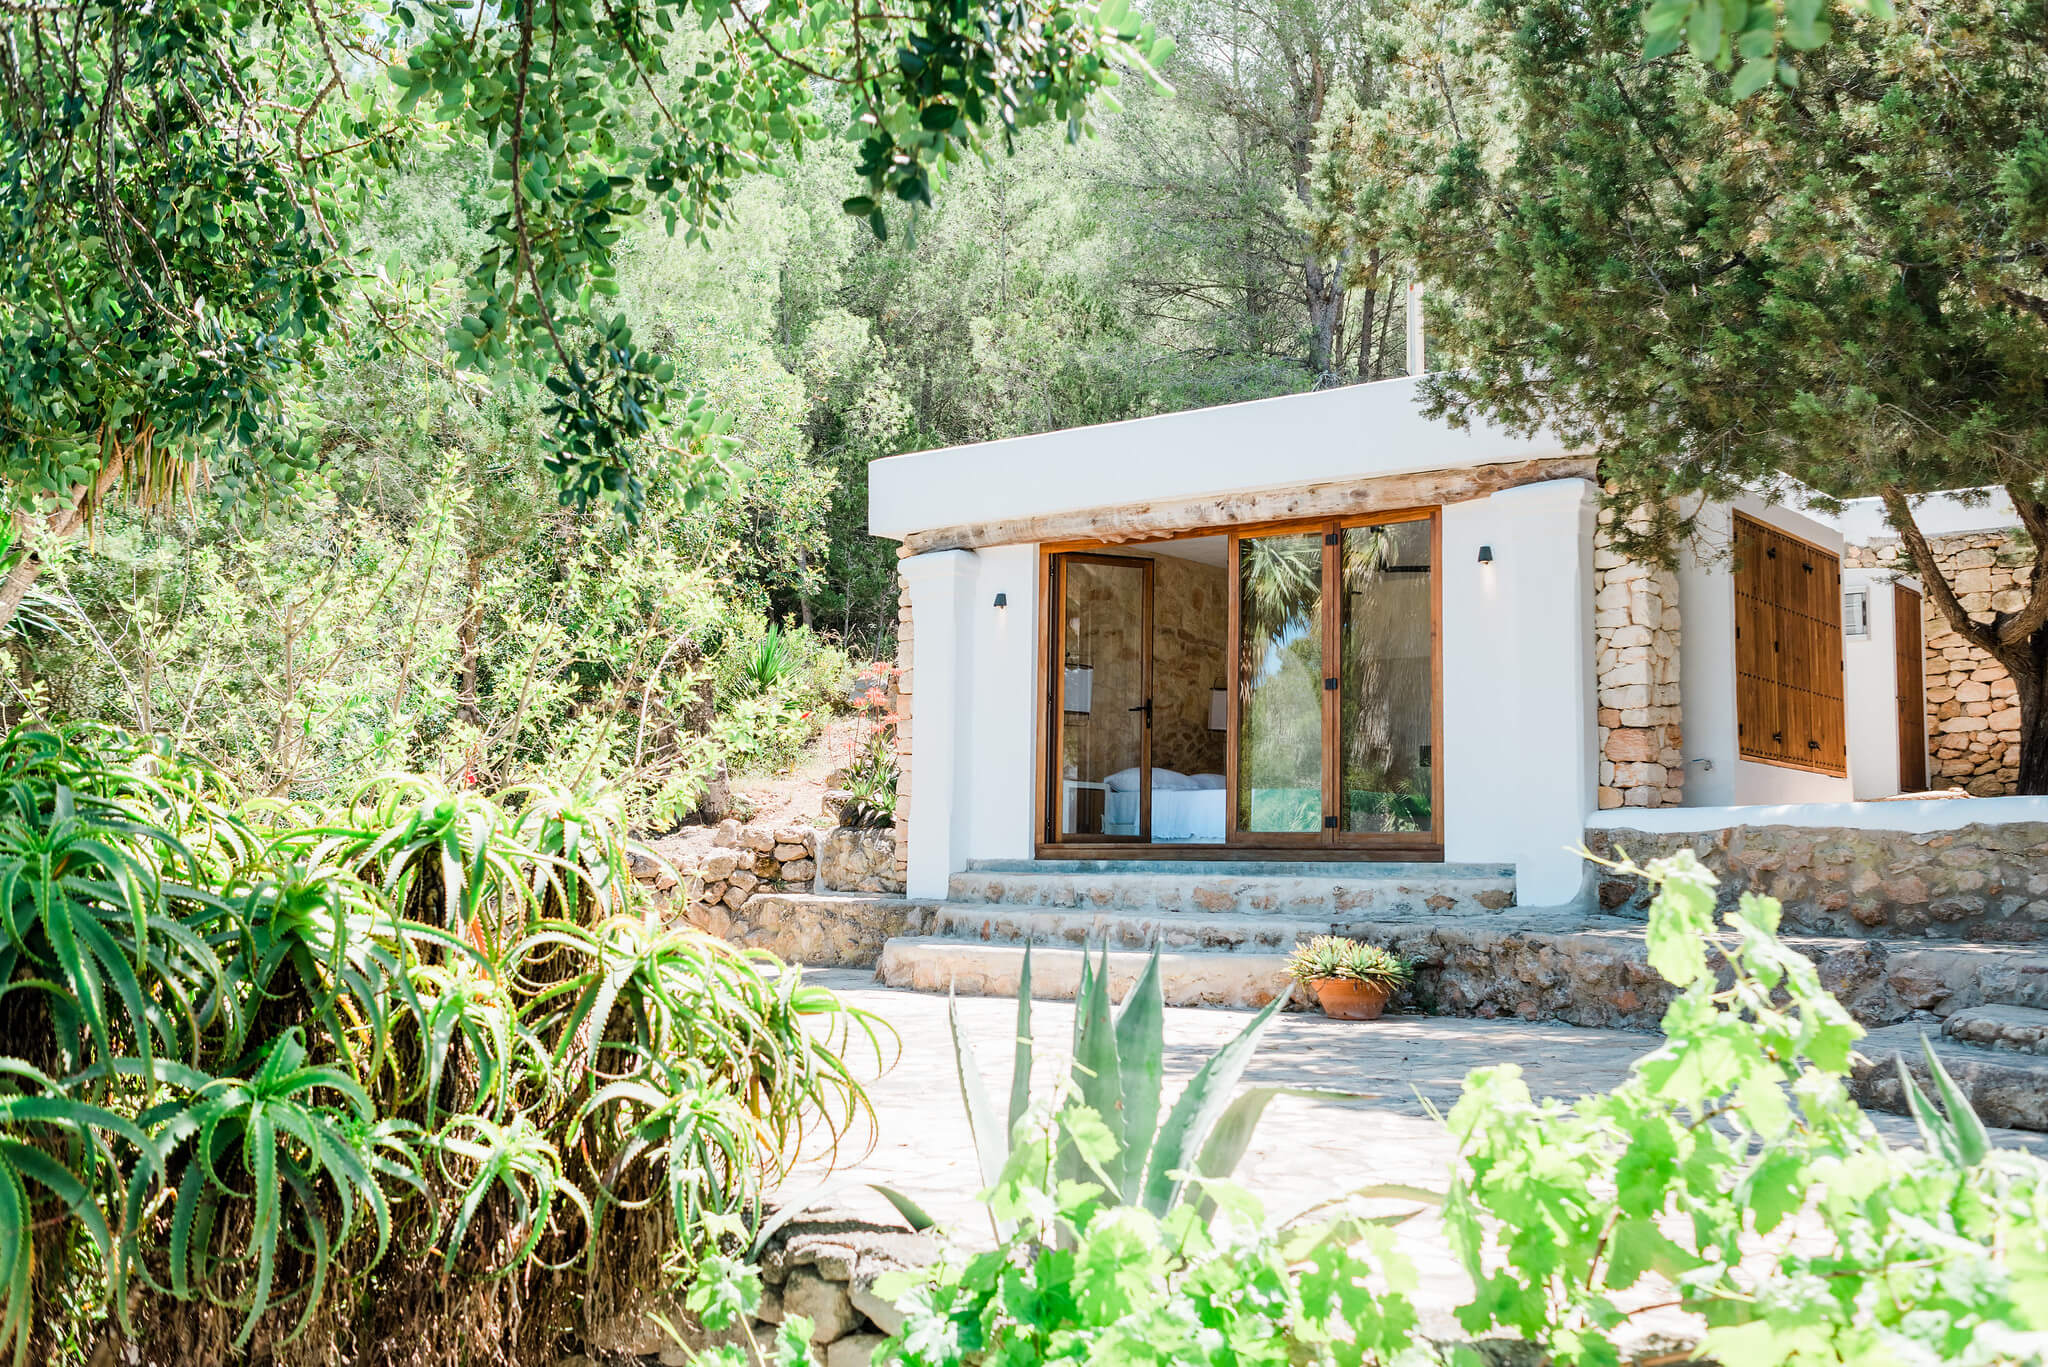 https://www.white-ibiza.com/wp-content/uploads/2020/06/white-ibiza-villas-can-calma-exterior-annex.jpg